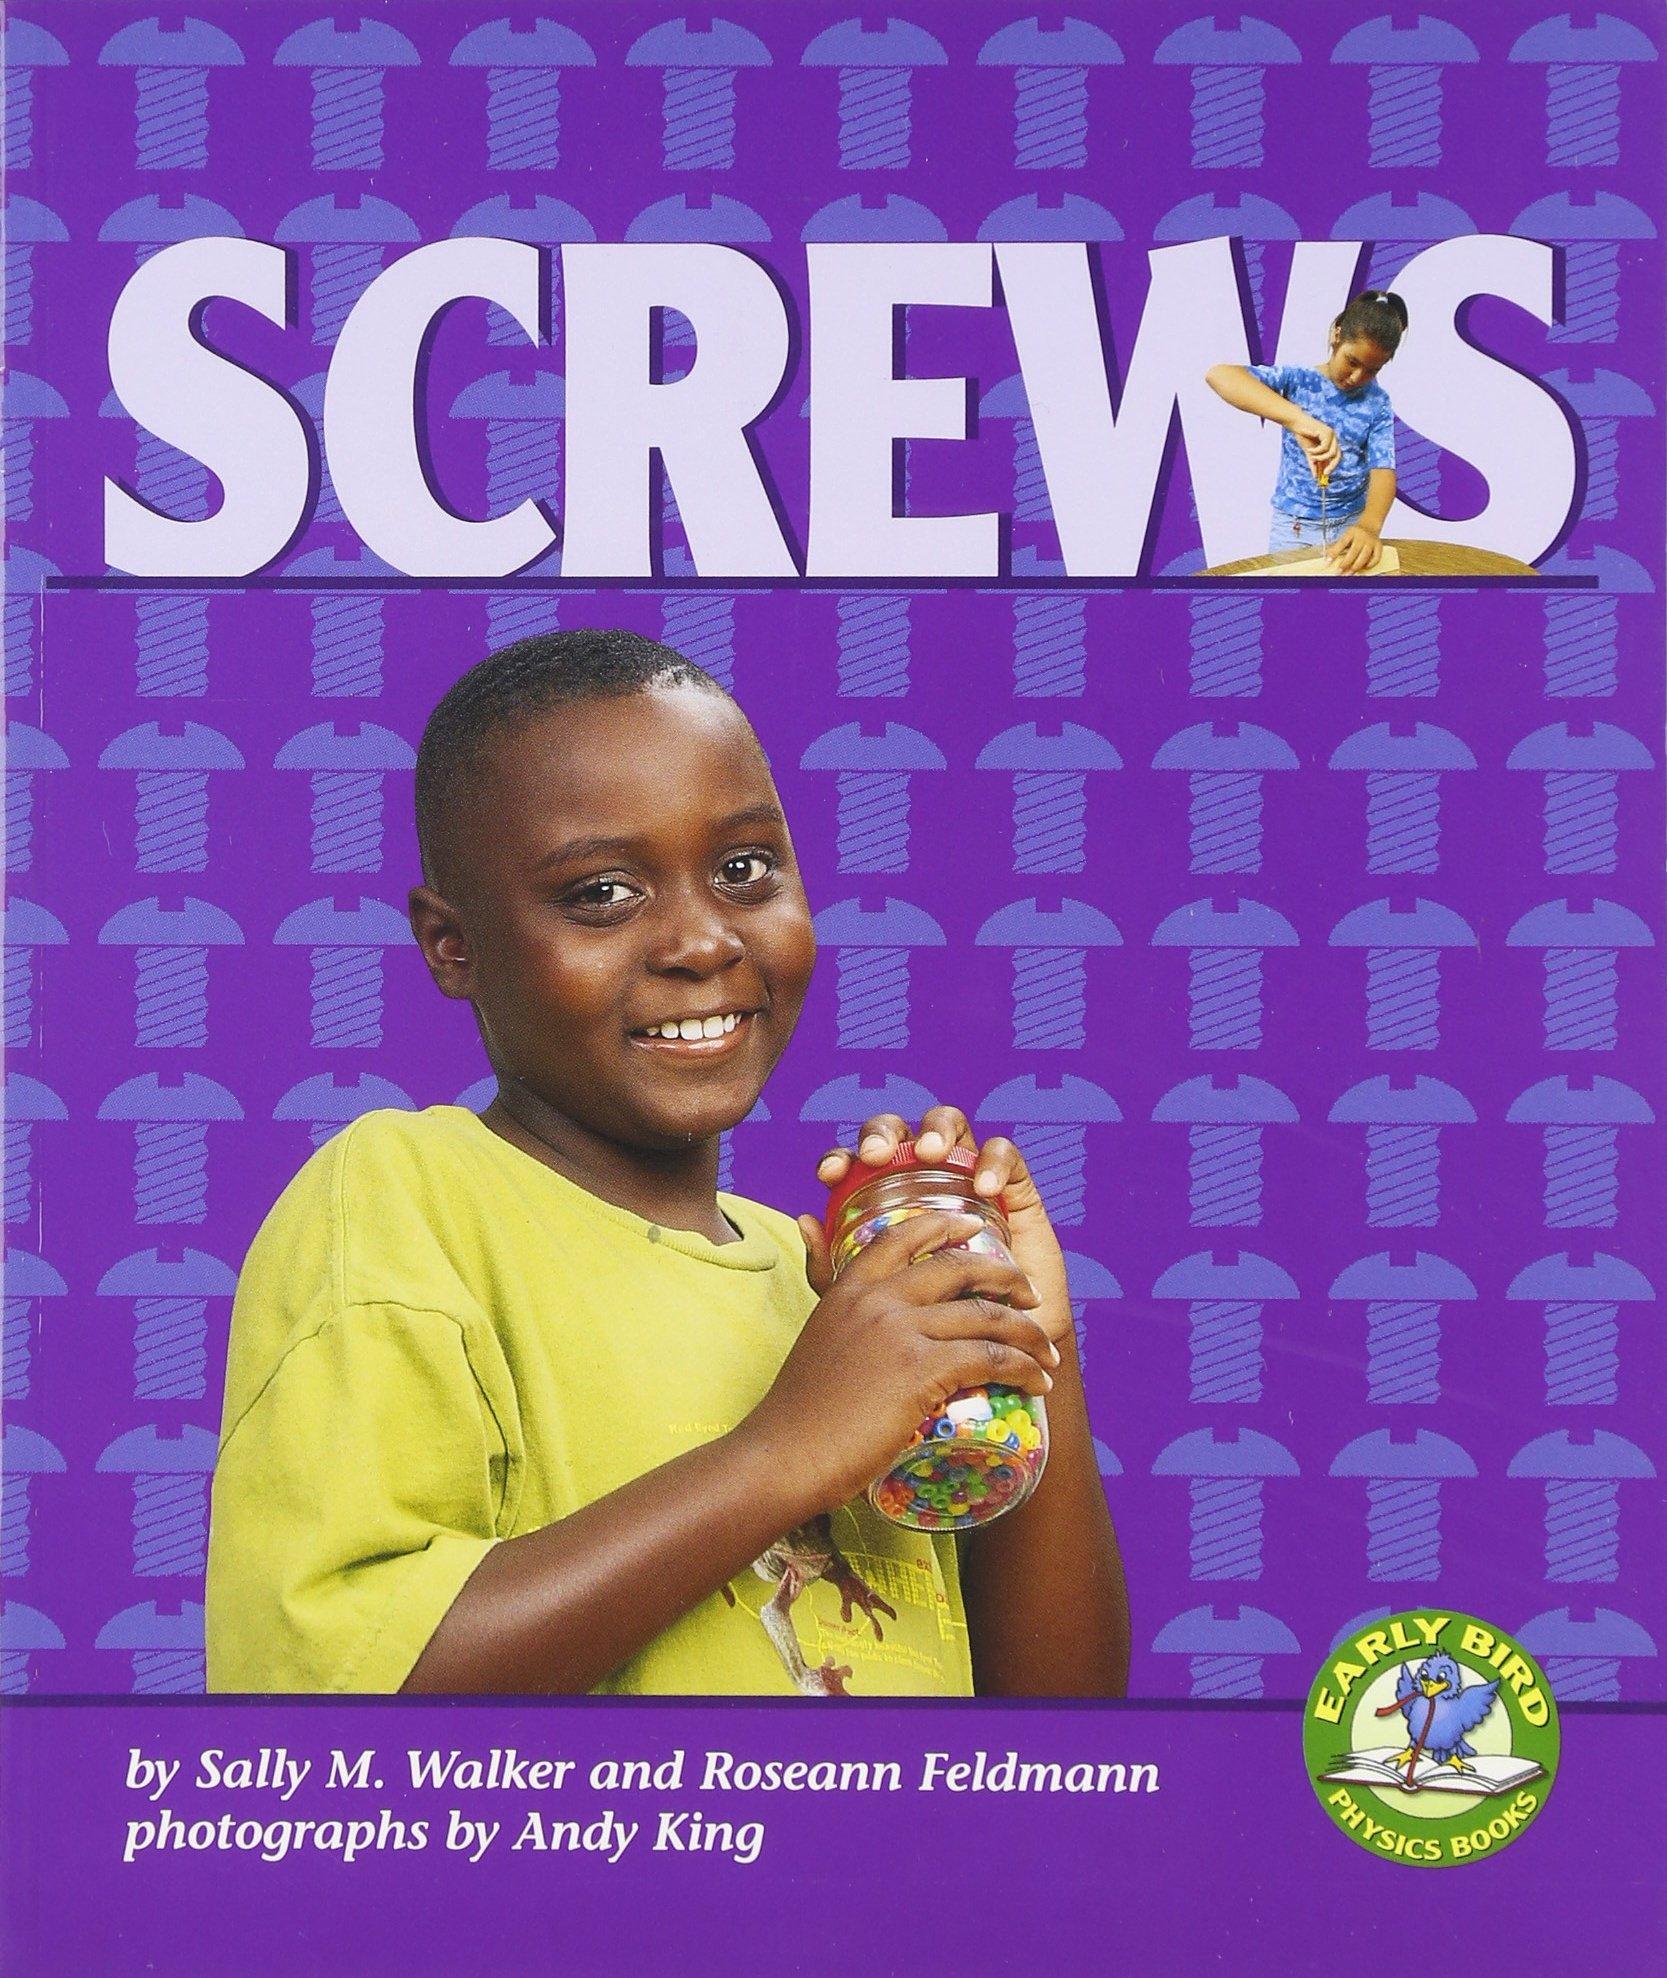 Screws (Early Bird Physics) (Early Bird Physics Series) pdf epub